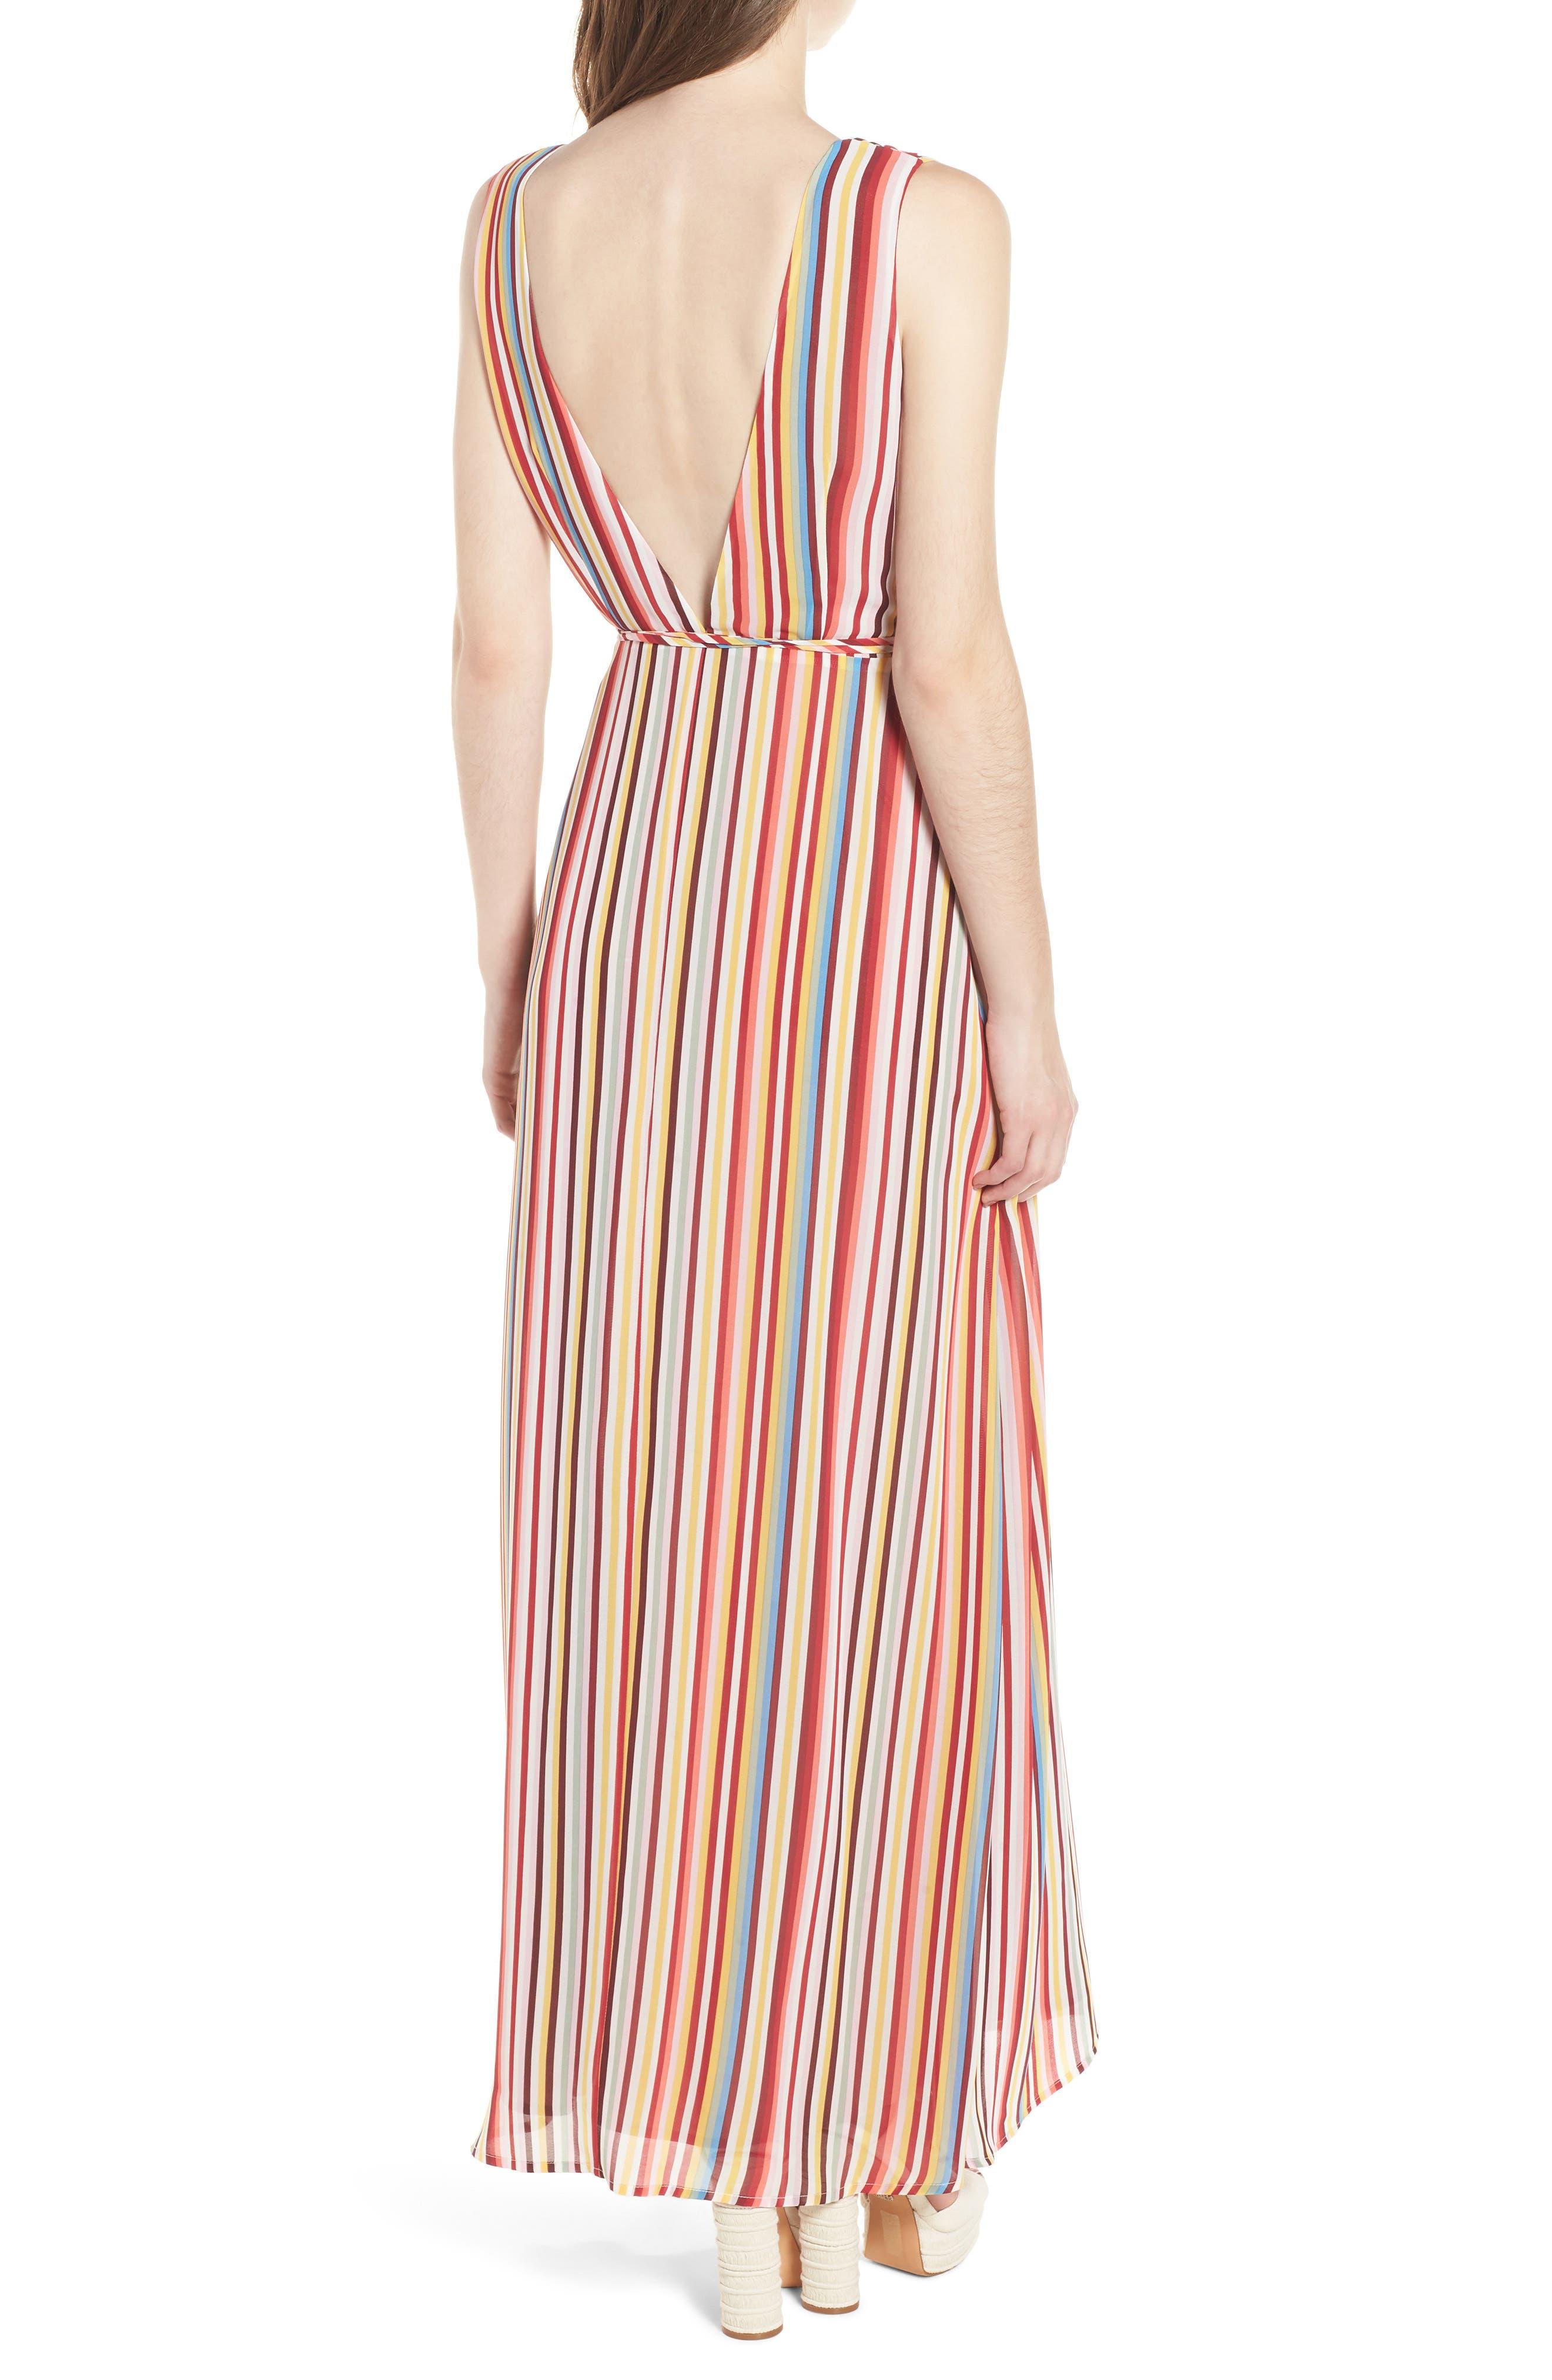 WAYF,                             Bobby Wrap Maxi Dress,                             Alternate thumbnail 2, color,                             605